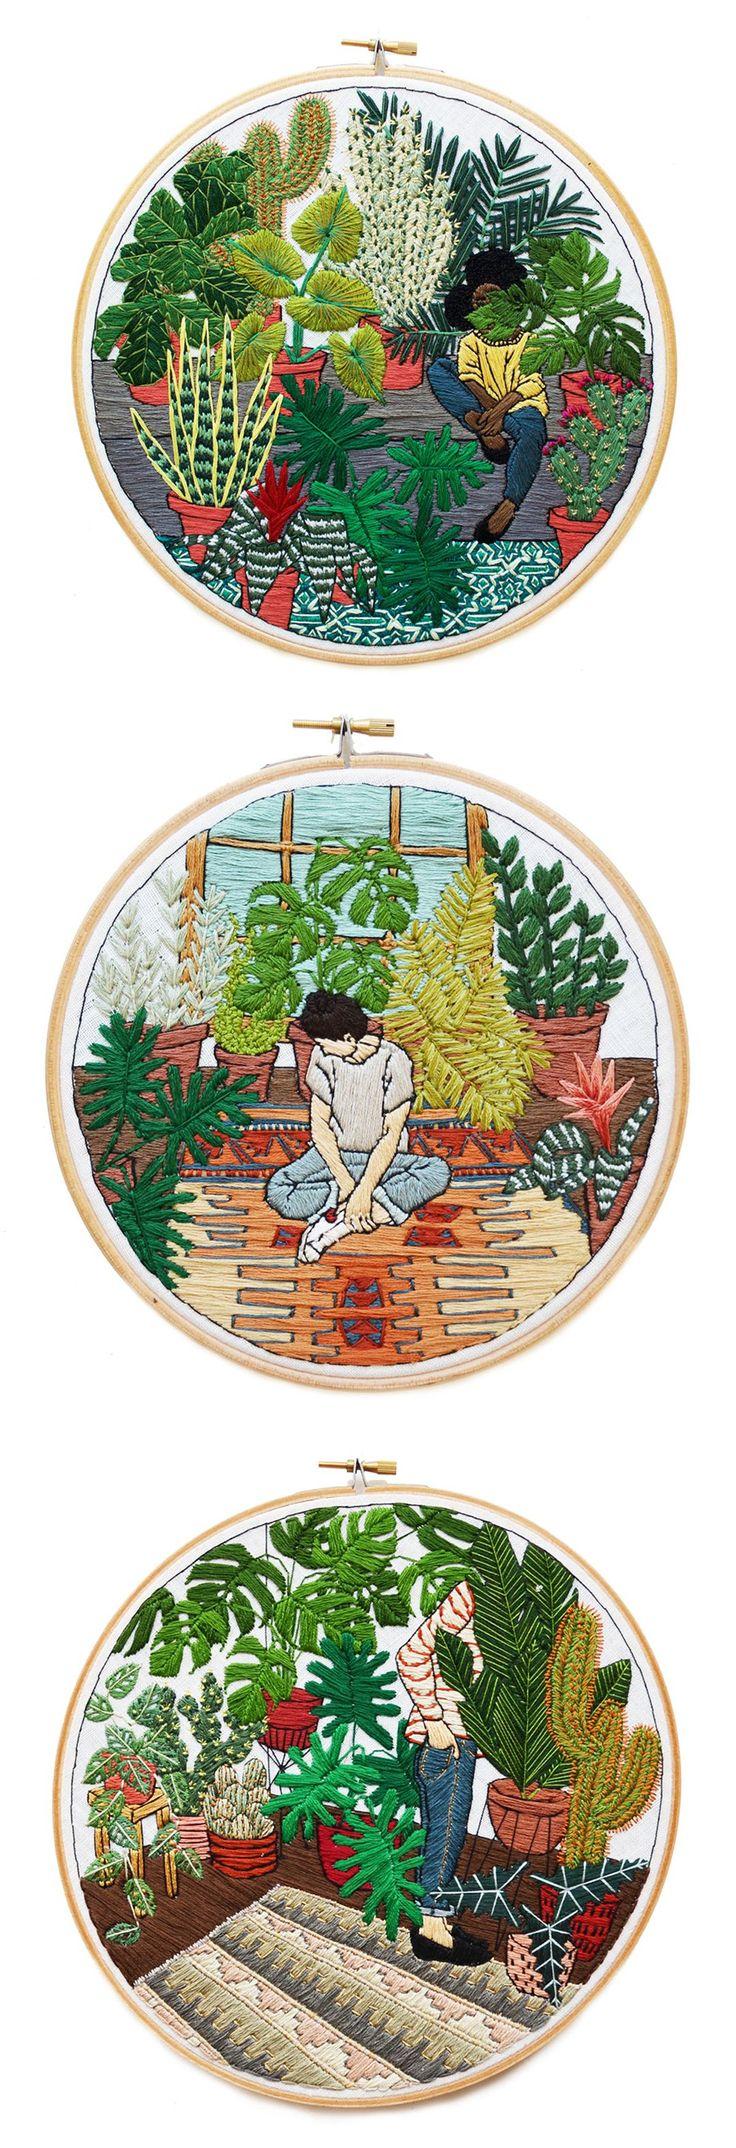 Contemporary embroidery | hoop art | Sarah K. Benning